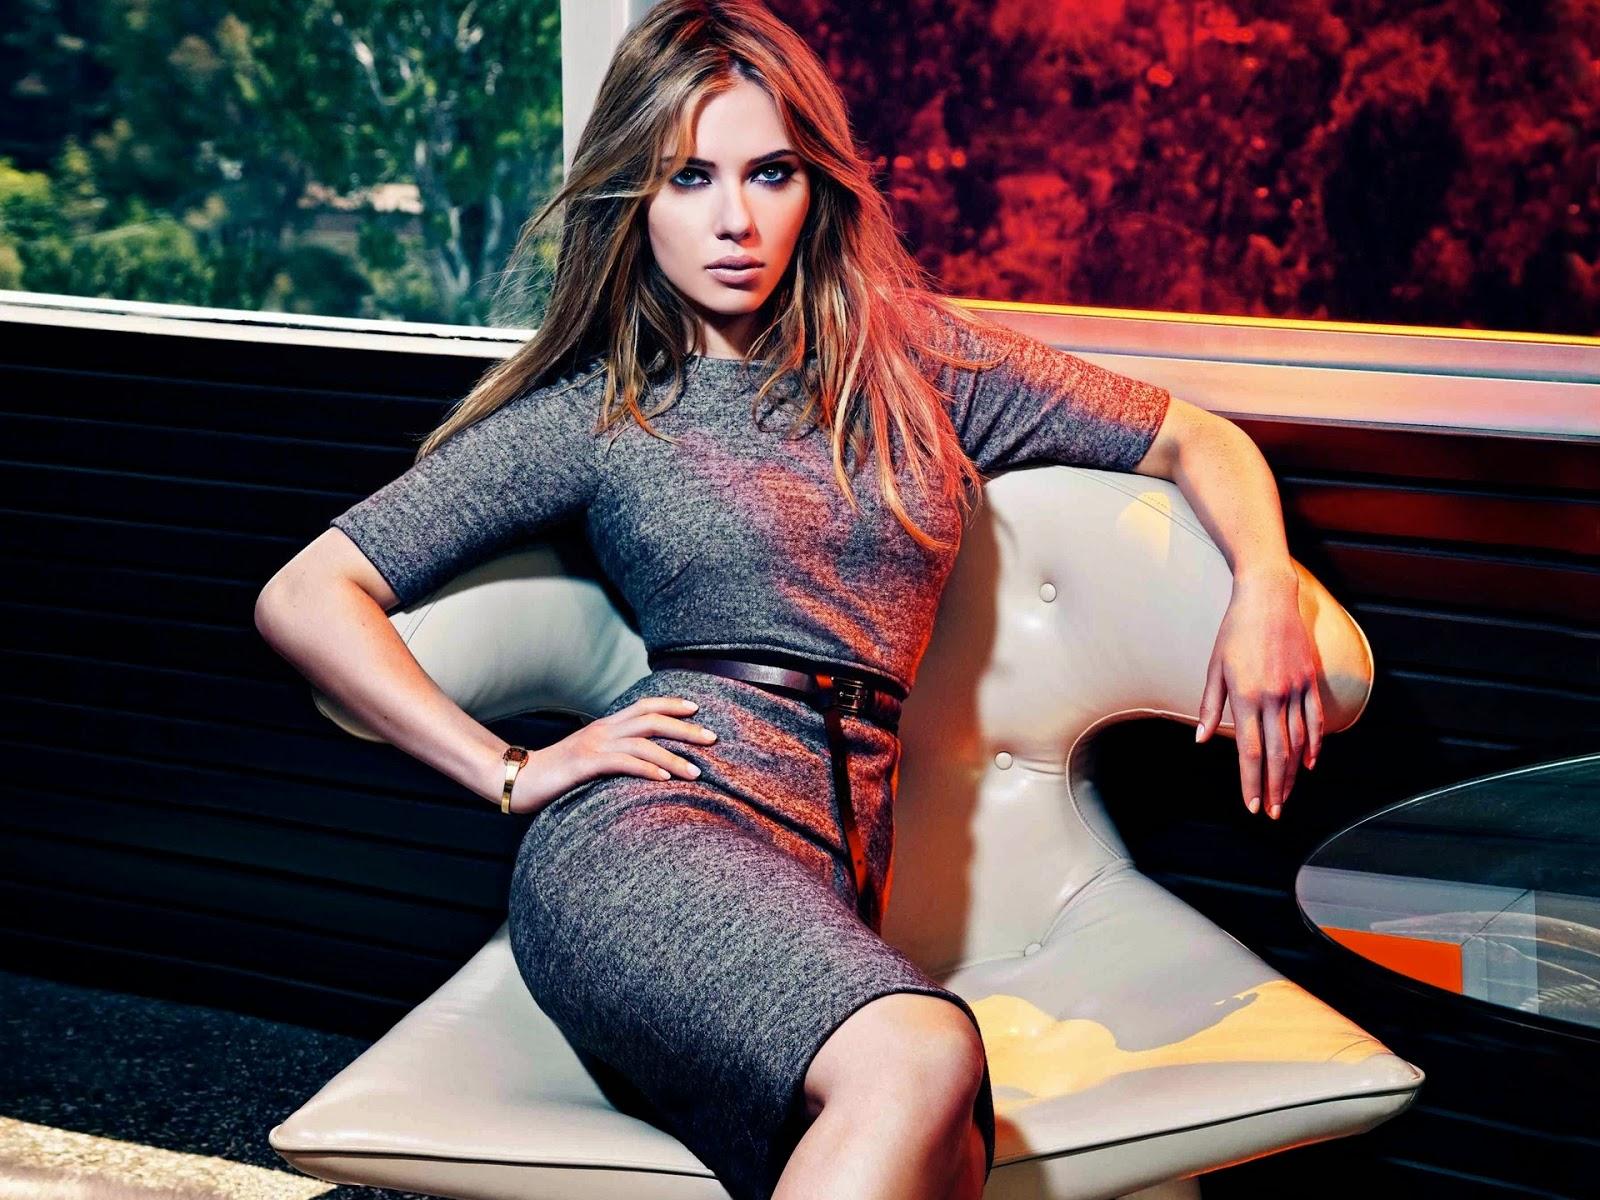 Hot Celebrity Scarlett Johansson Pictures